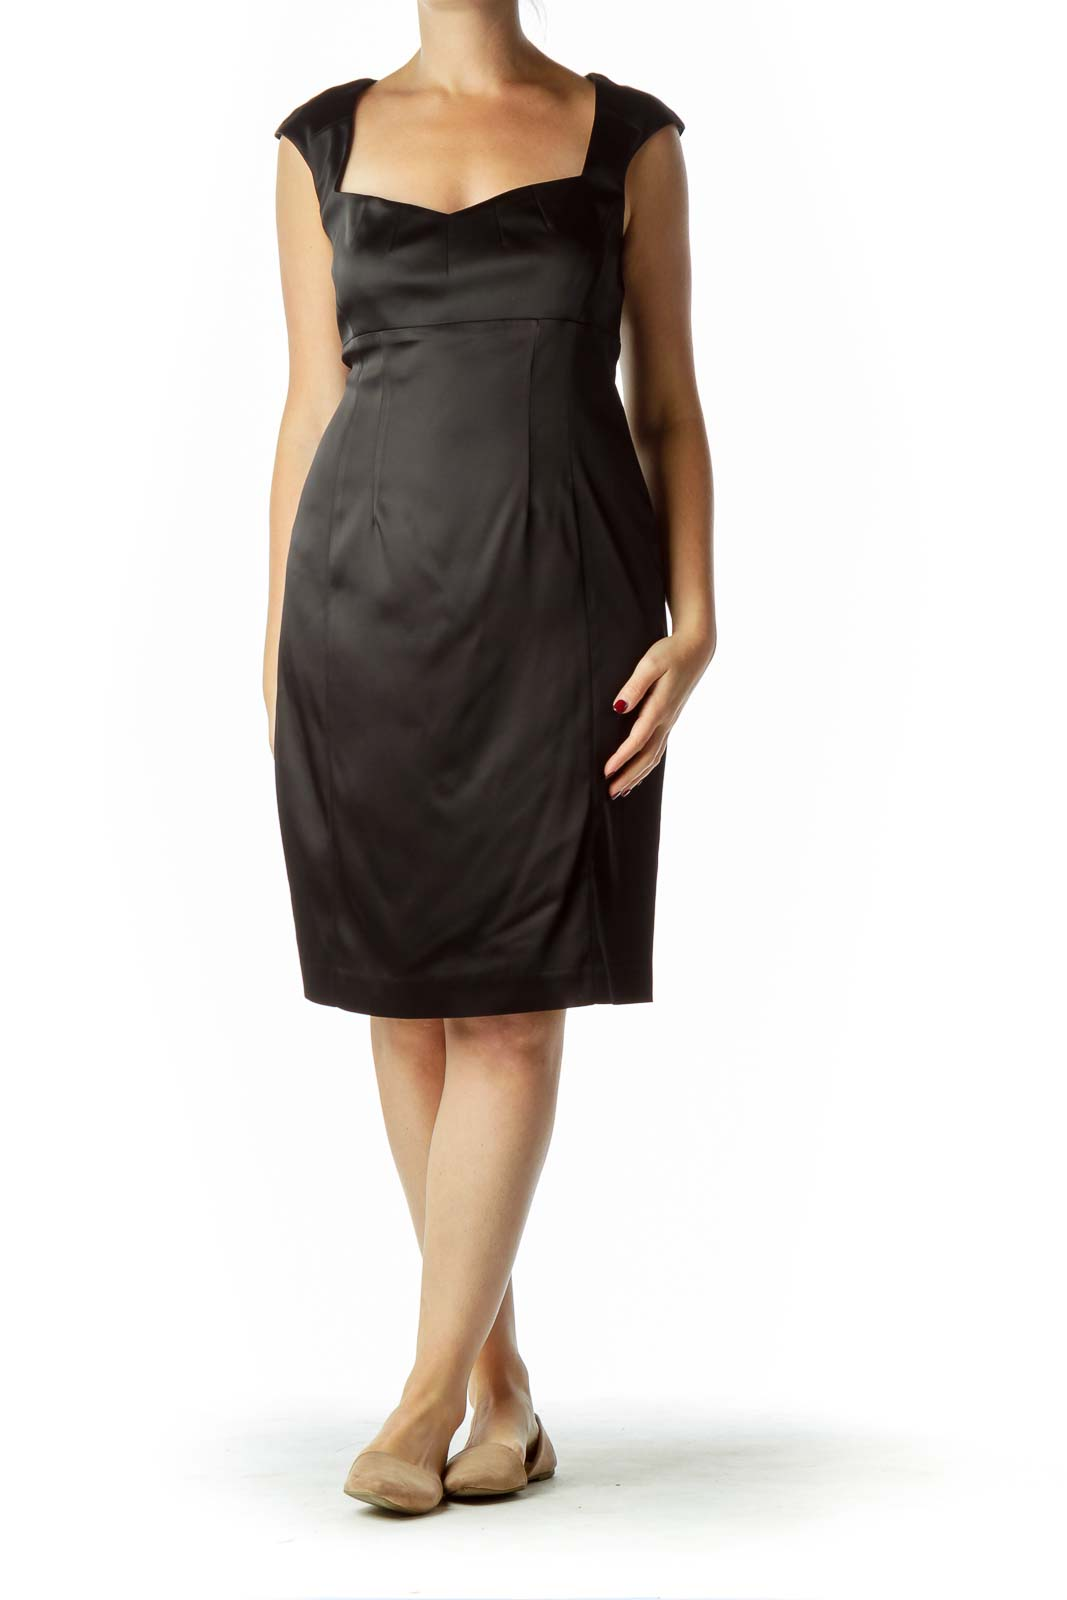 Black Satin Empire Waist Cocktail Dress